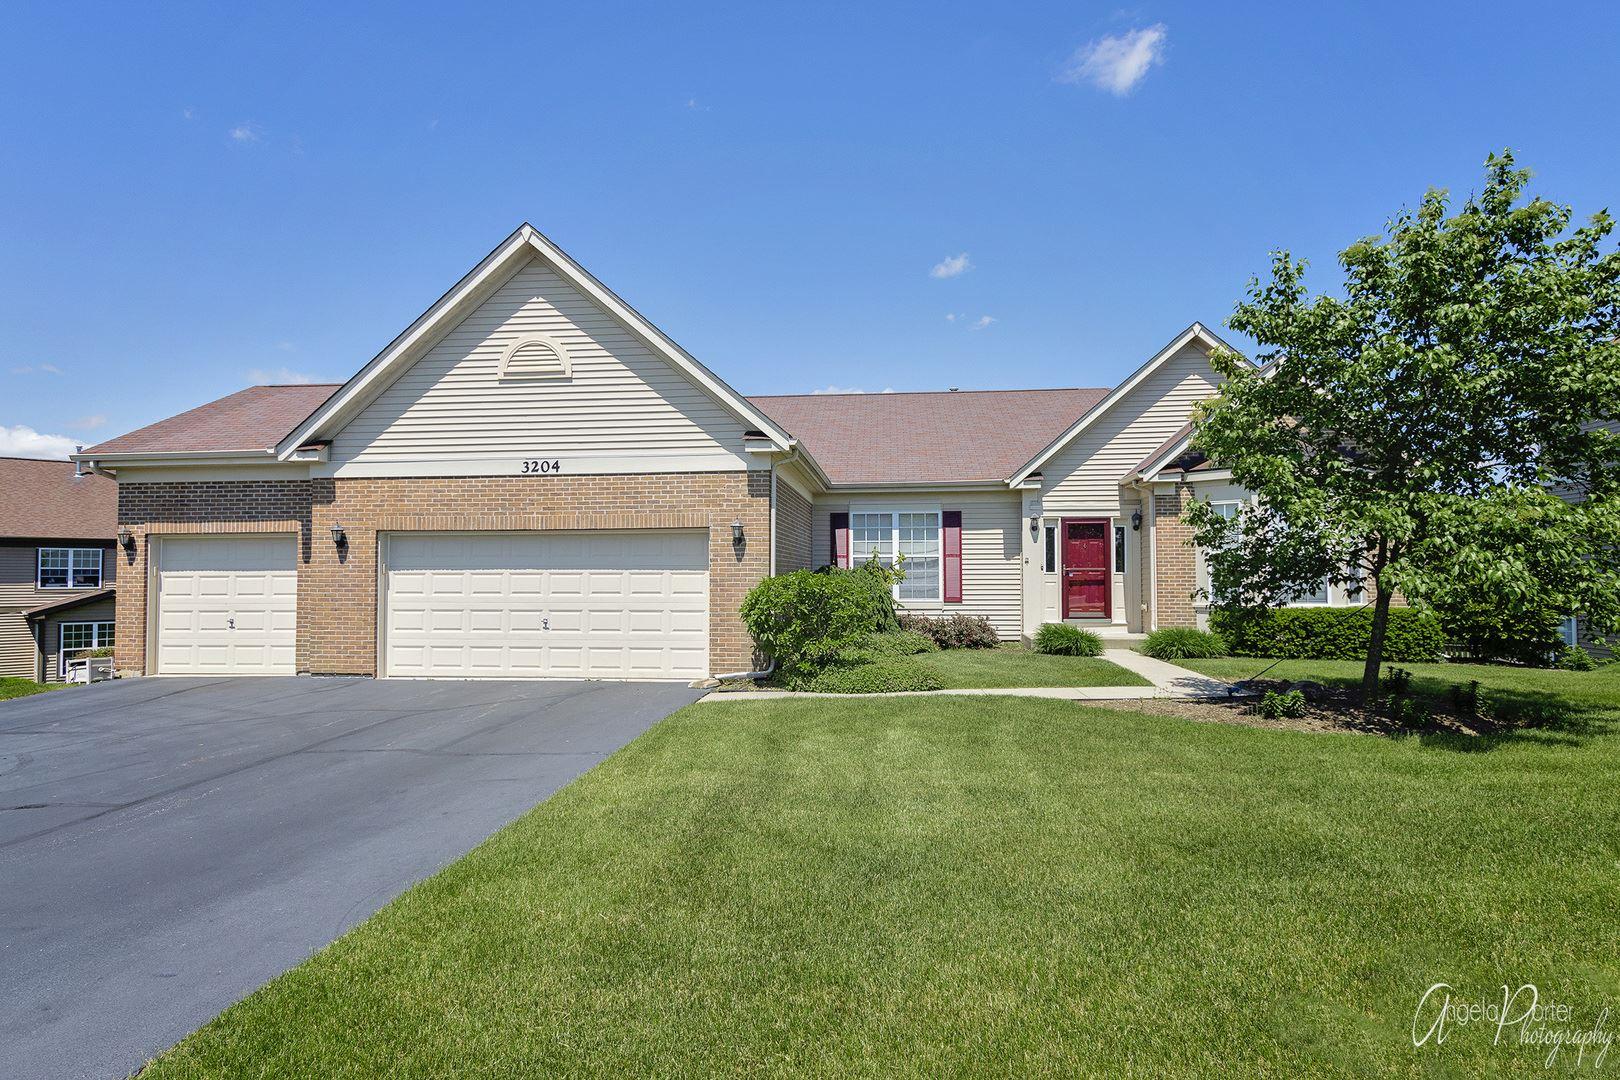 3204 Kendall Crossing, Johnsburg, IL 60051 - #: 10729175